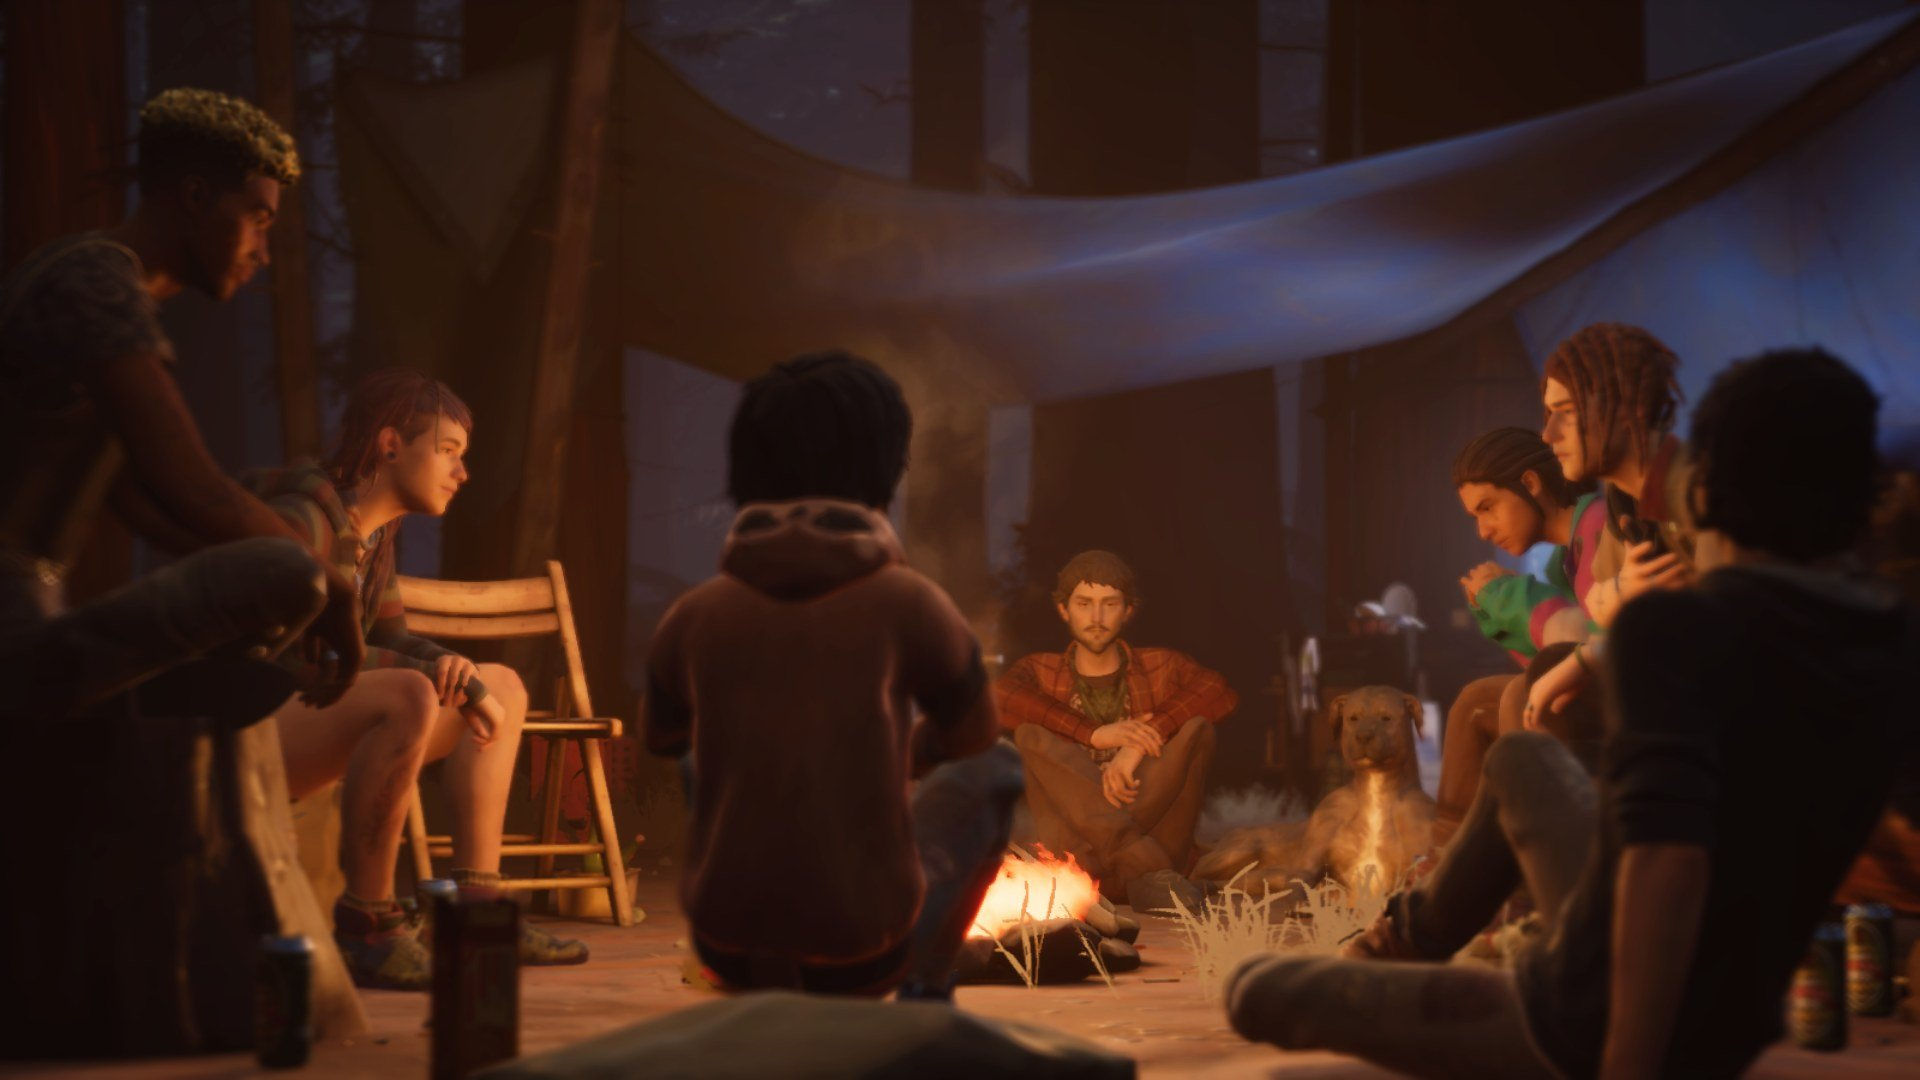 Life is Strange 2 Episode 3 enjoying the campfire